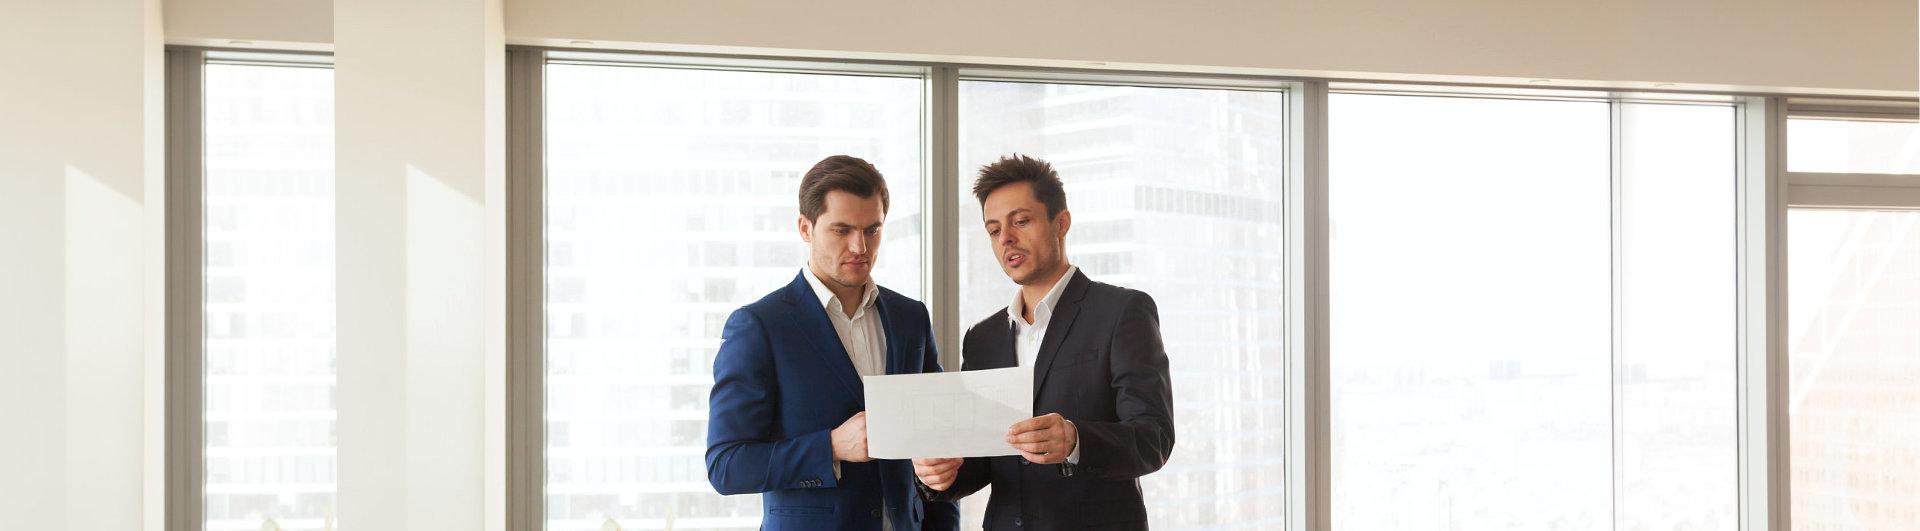 business man planning concept